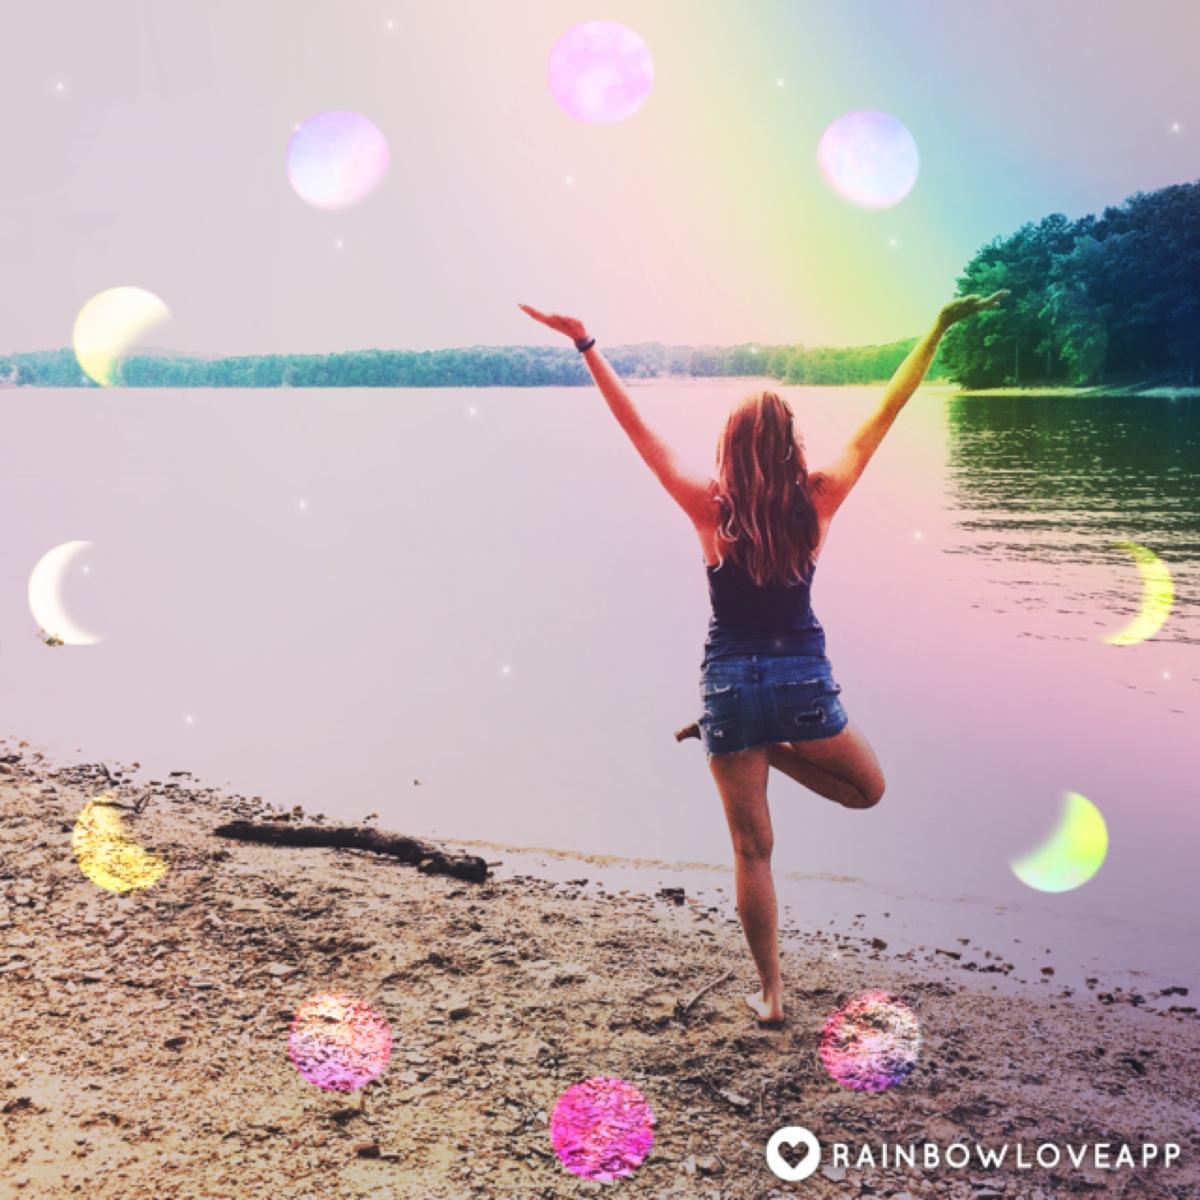 rainbow-love-app-filter-layer-filters-rainbow-4-moon-6-moons-7